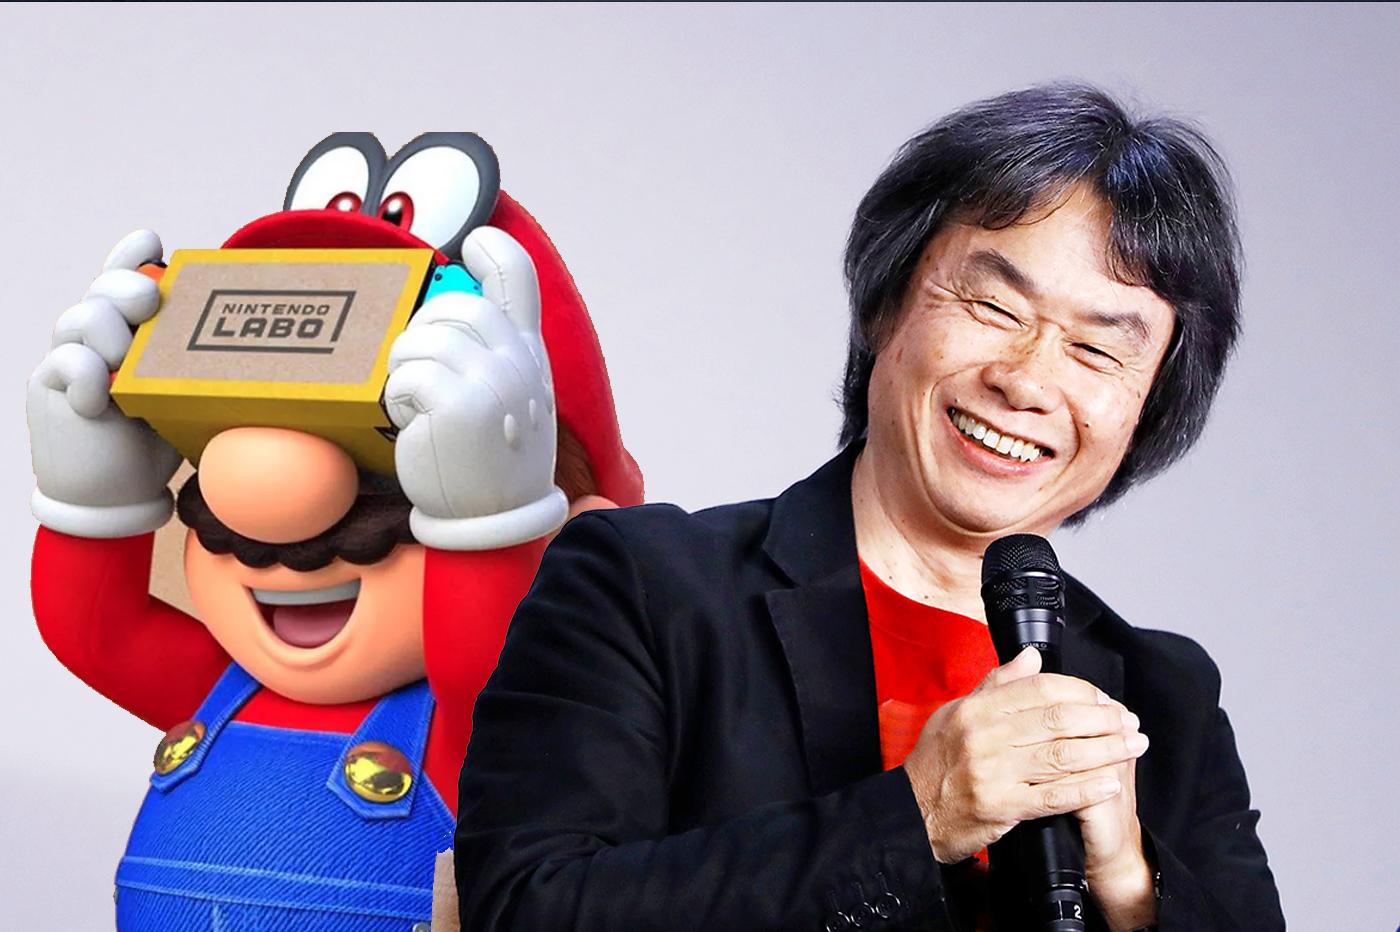 Nintendo pas en retard sur la réalité virtuelle selon Miyamoto